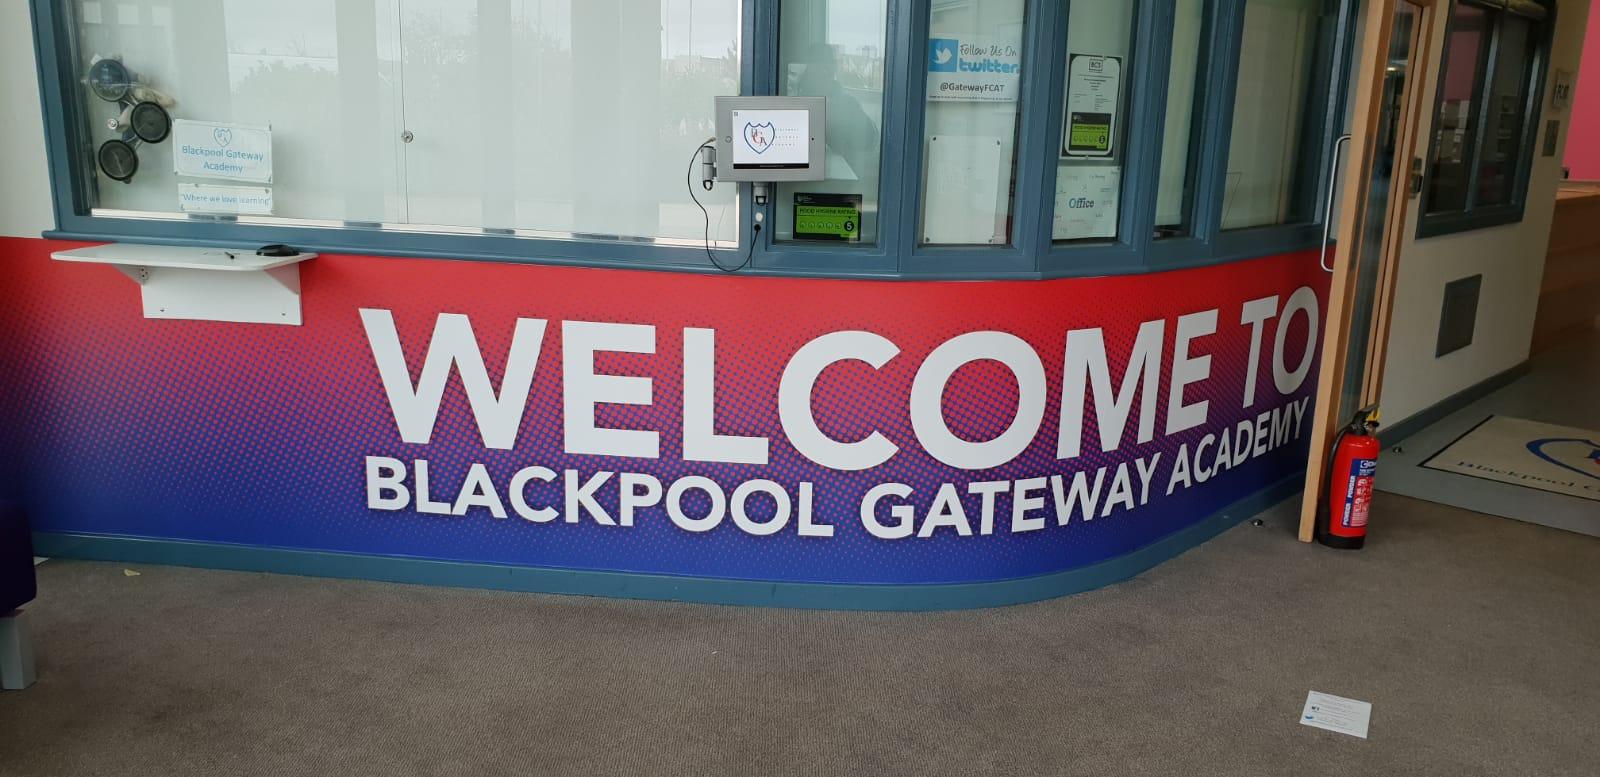 Gateway Academy Wall Graphics Blackpool